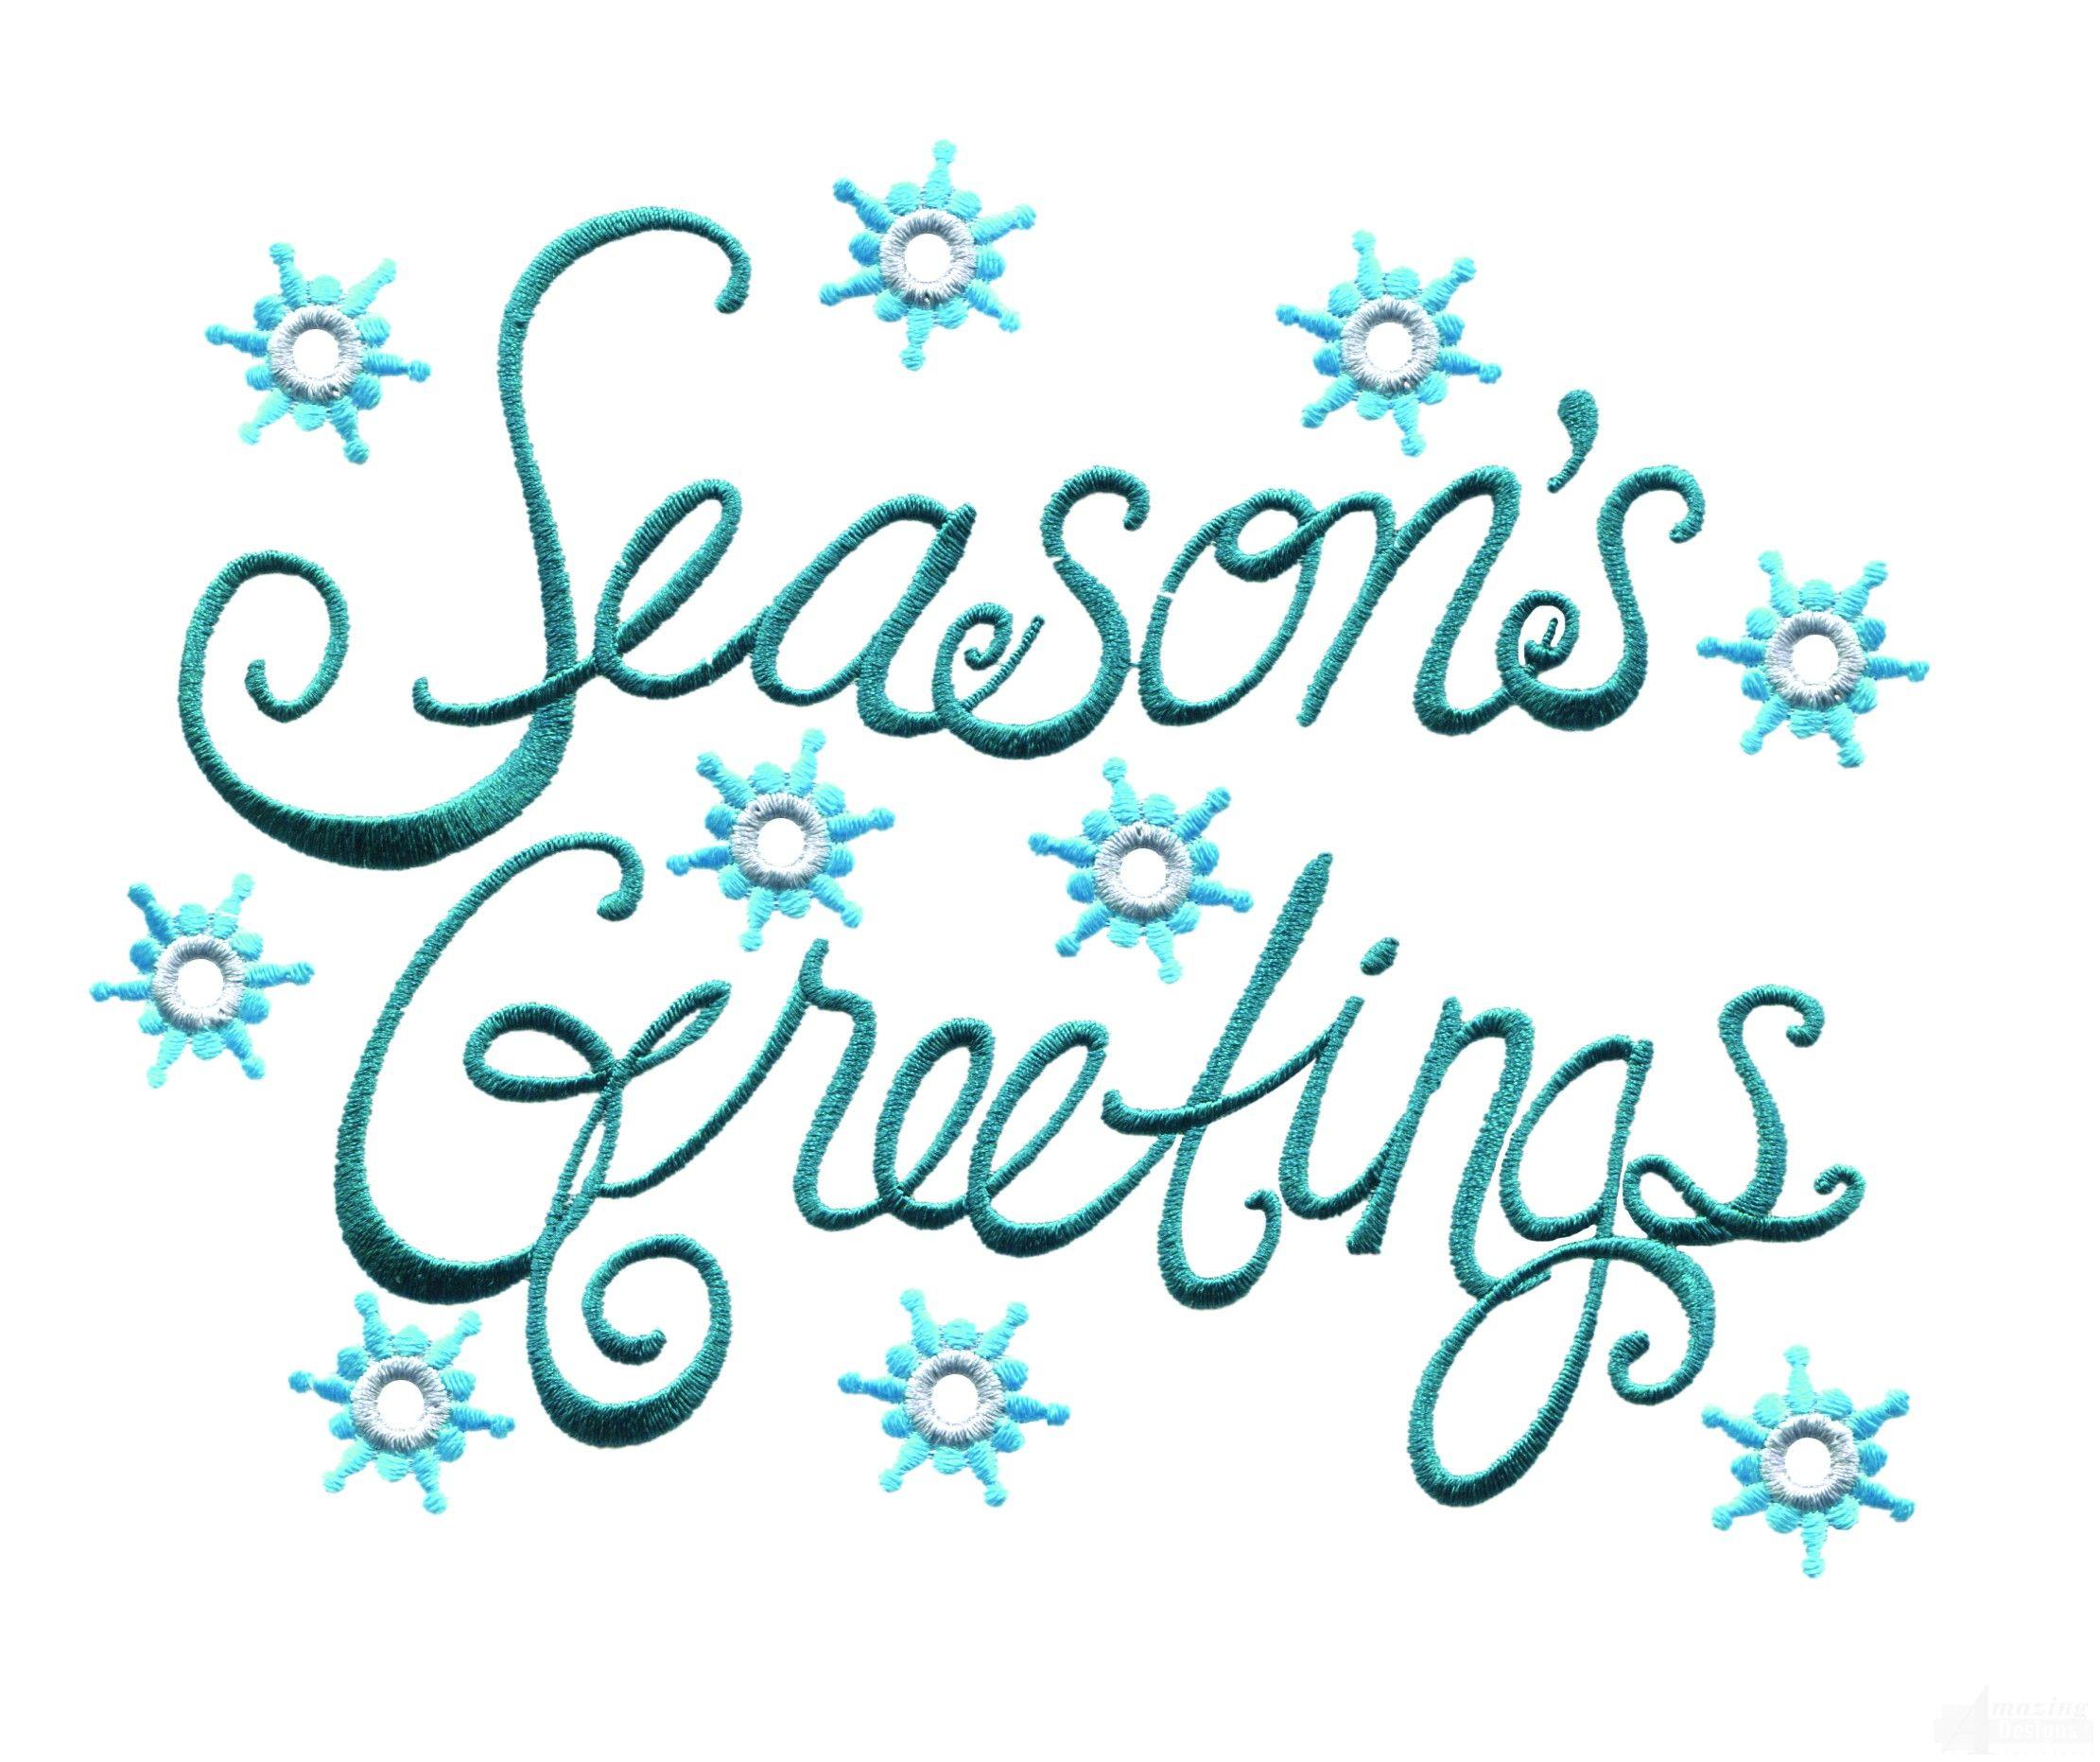 season greetings clip art bright seasons greetings embroidery rh pinterest com free seasons greetings clipart images seasons greetings clipart free